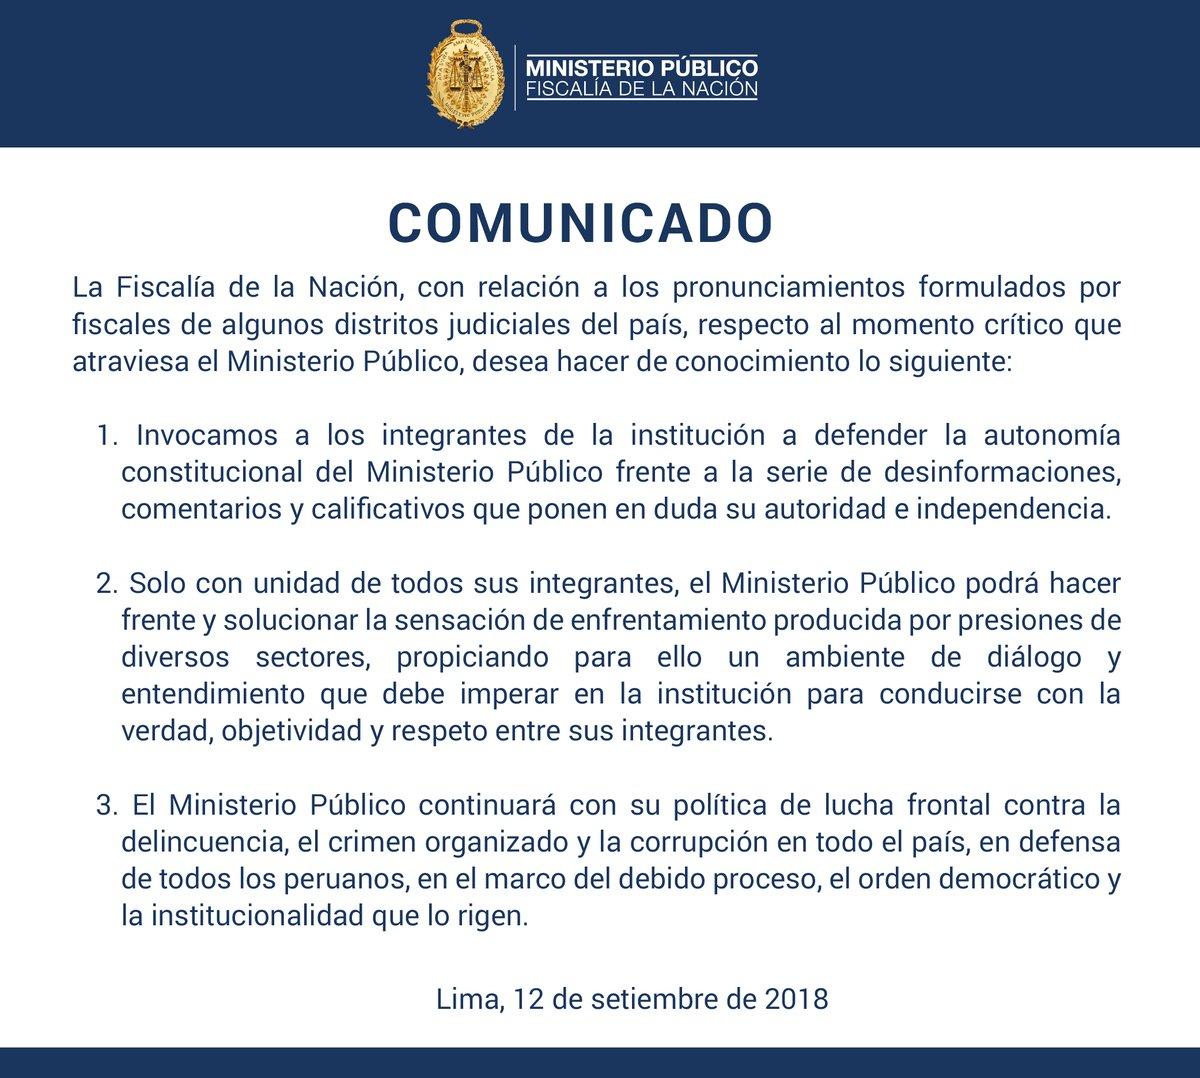 Fuente: Twitter del Ministerio Público.